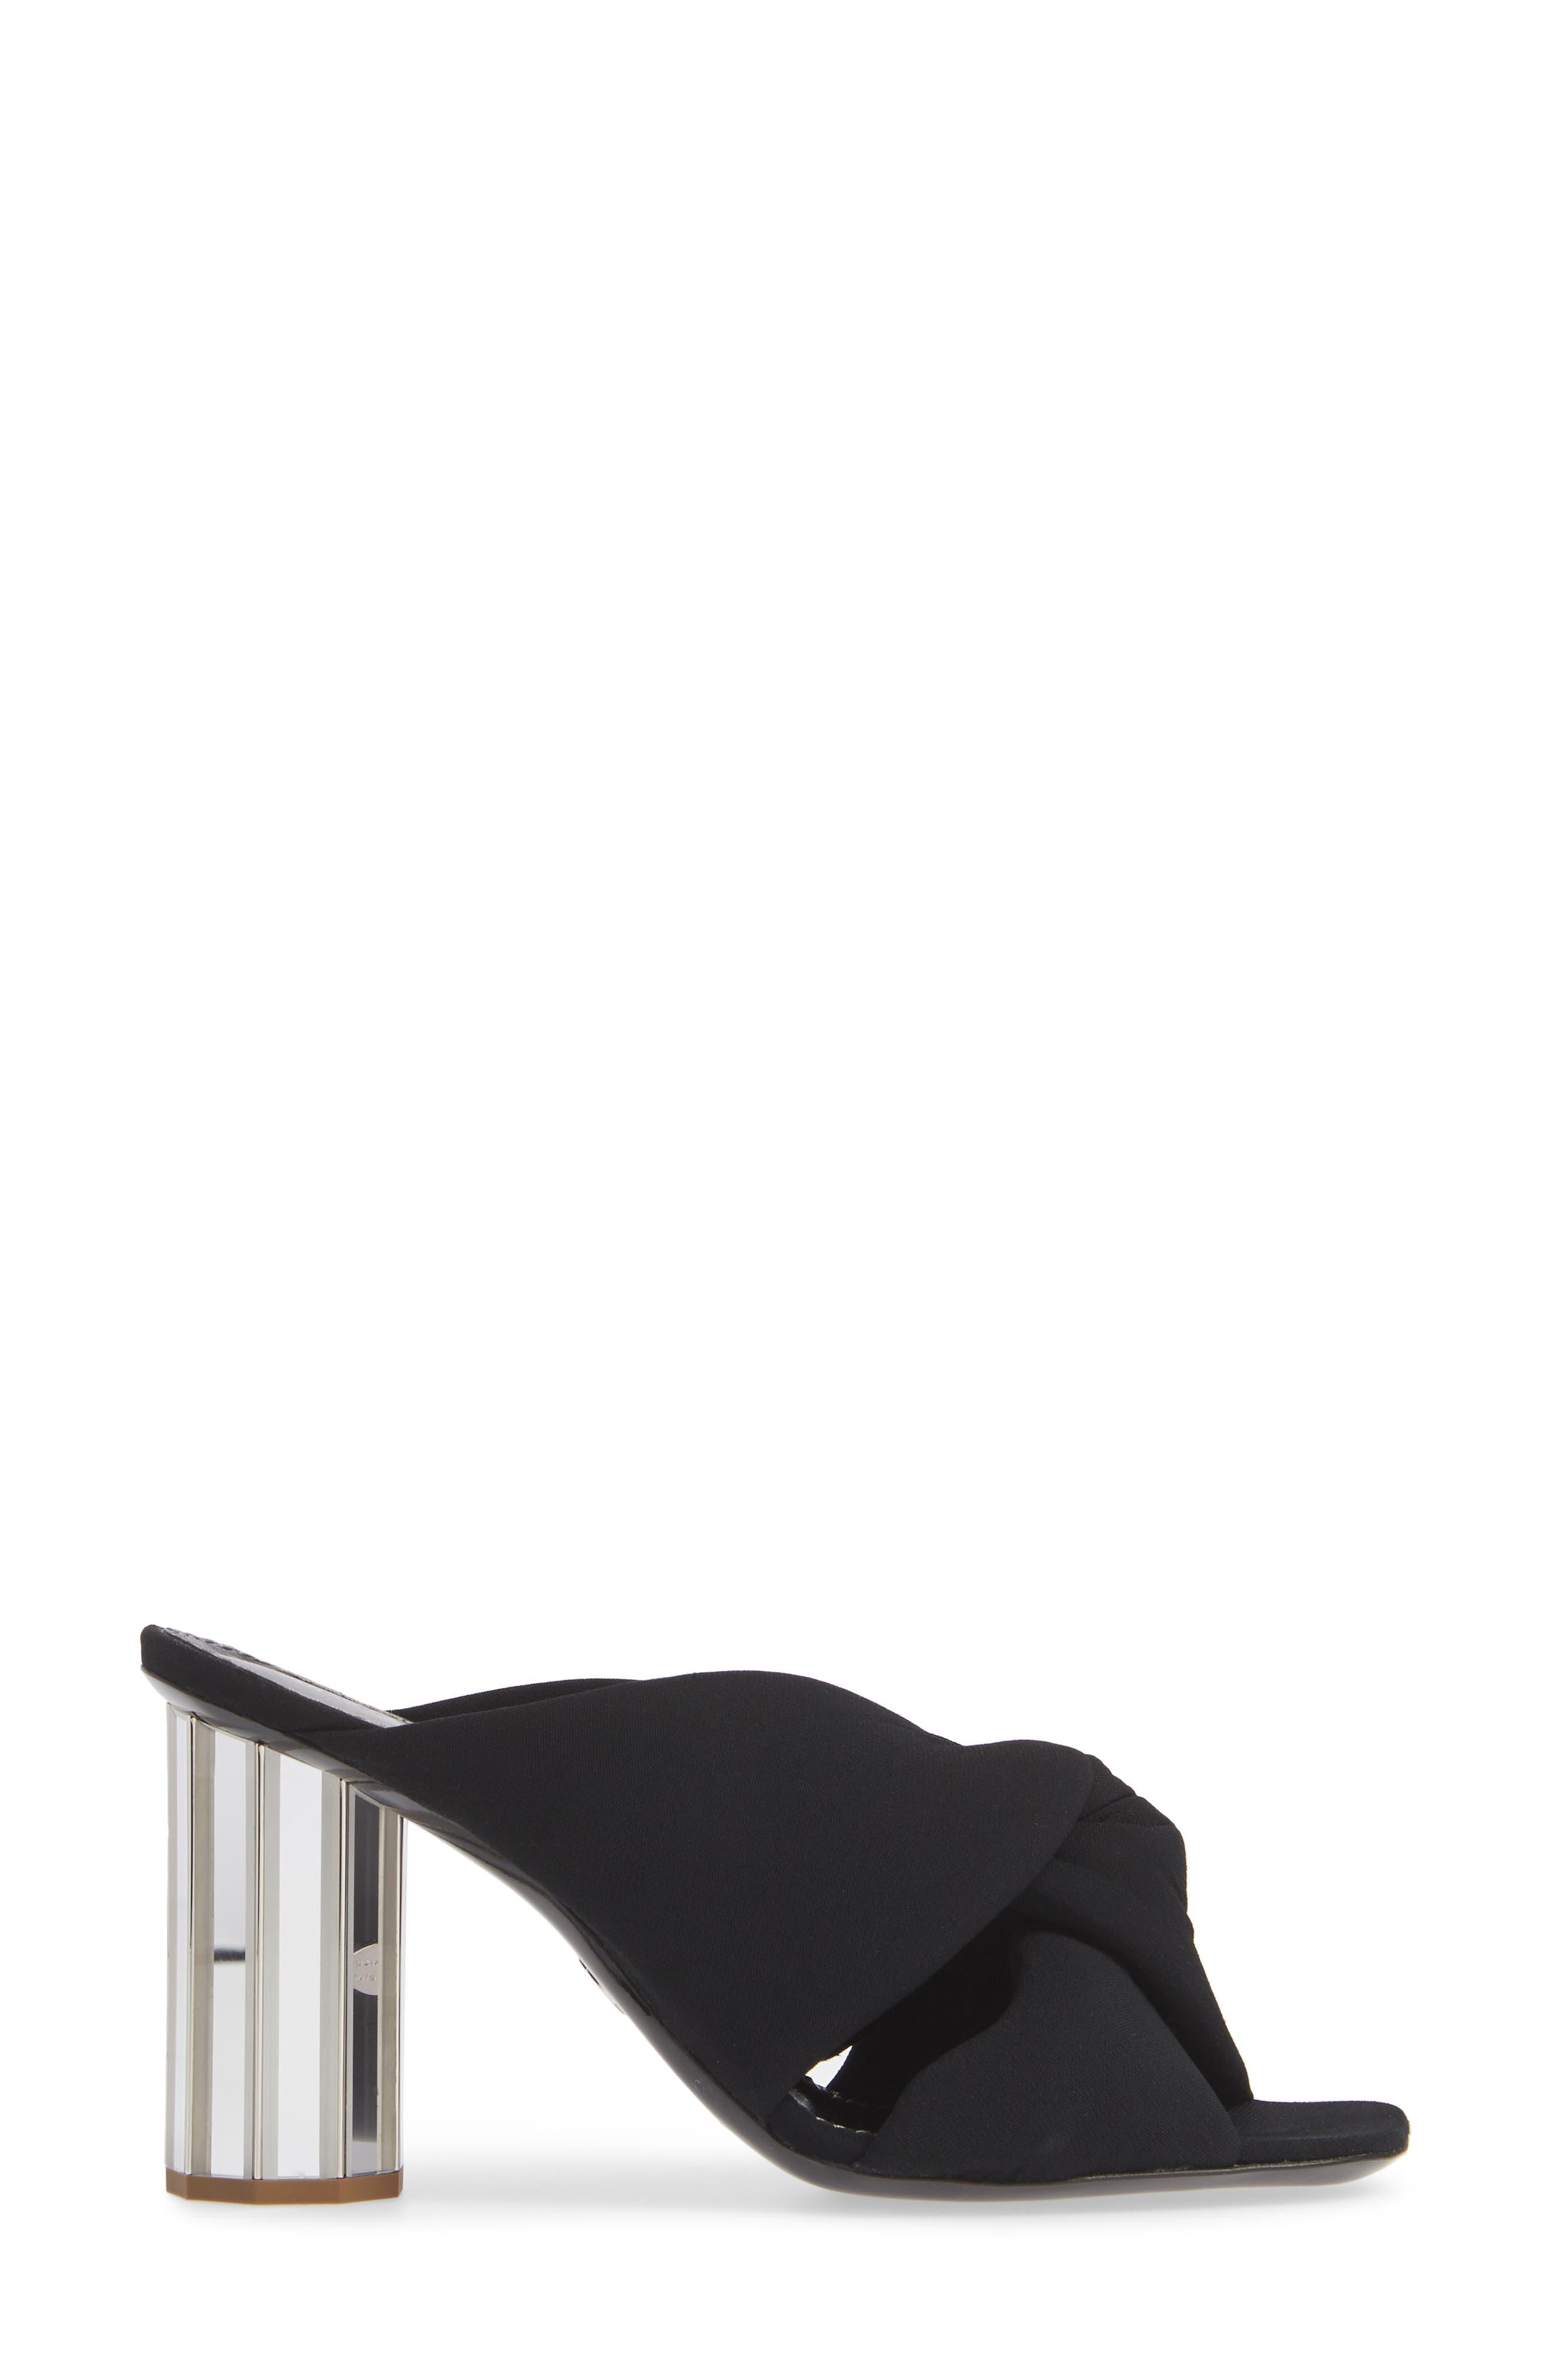 PROENZA SCHOULER, Knotted Slide Sandal, Alternate thumbnail 3, color, BLACK